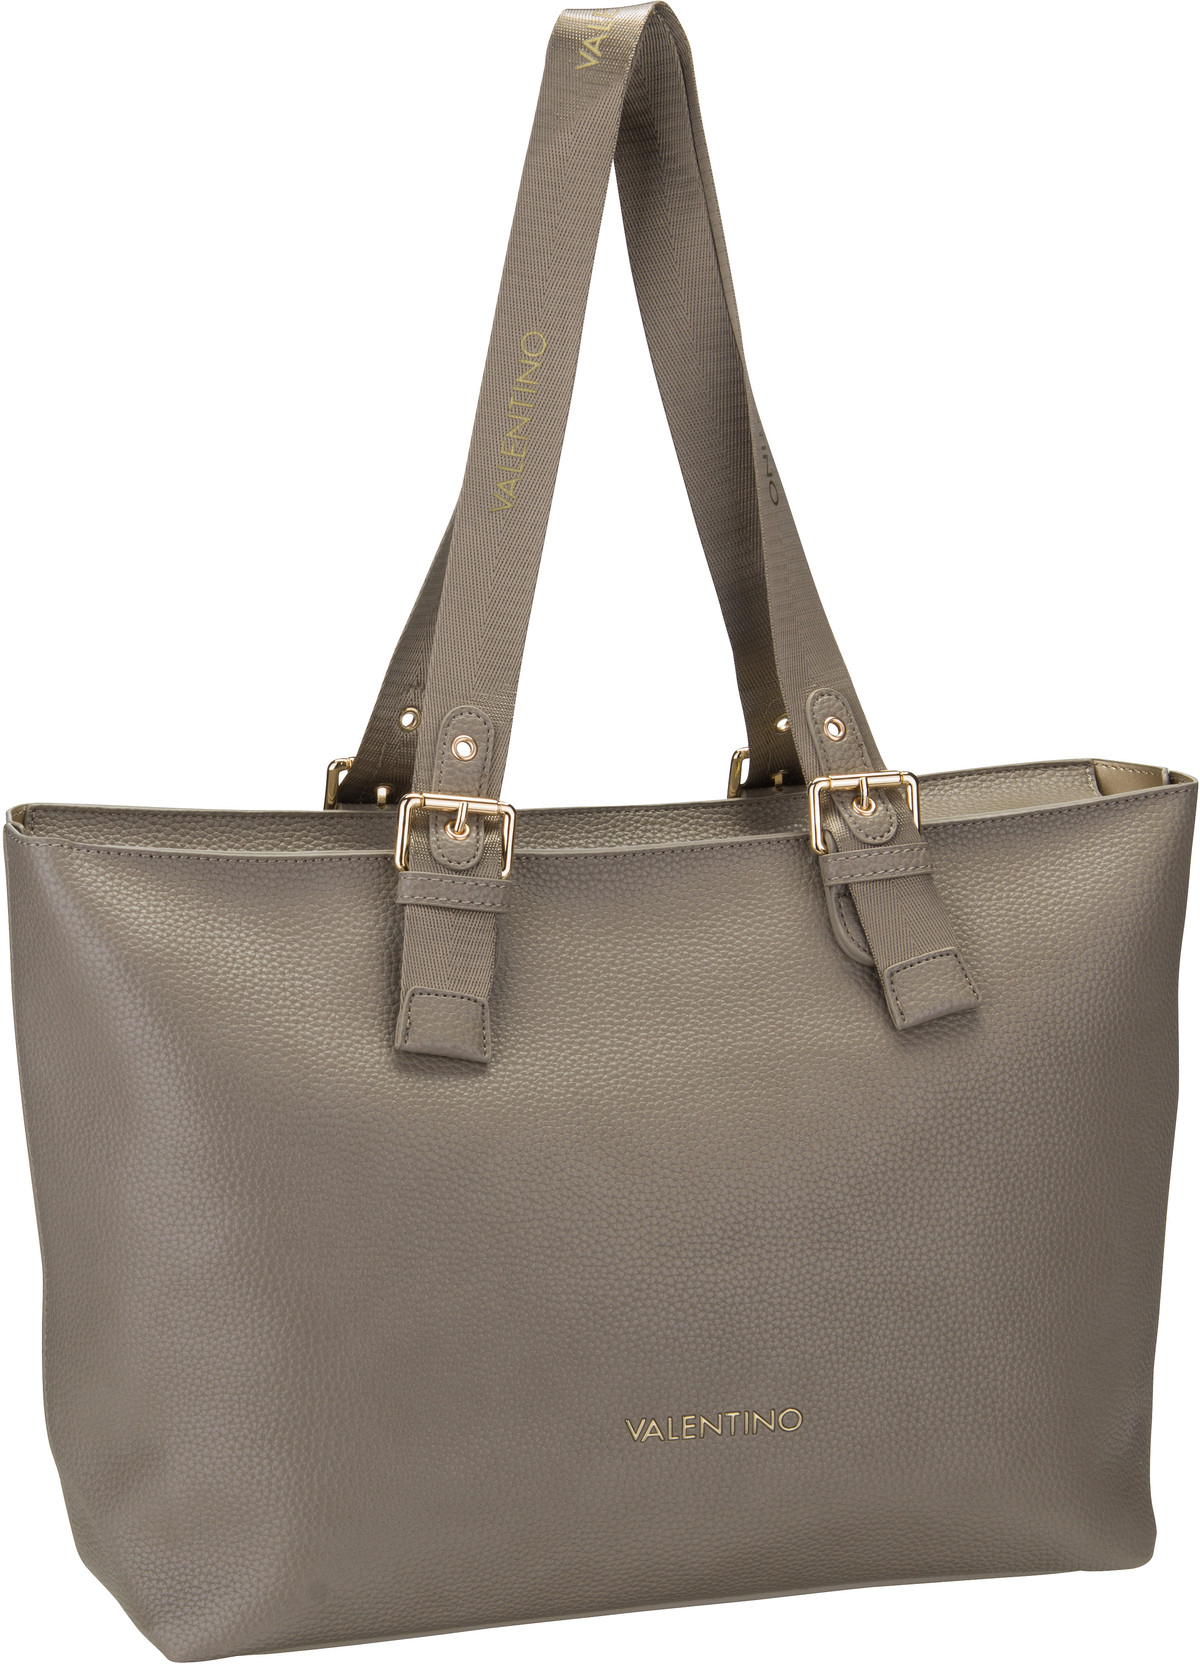 Bags Handtasche Babar Shopping Z01 Taupe